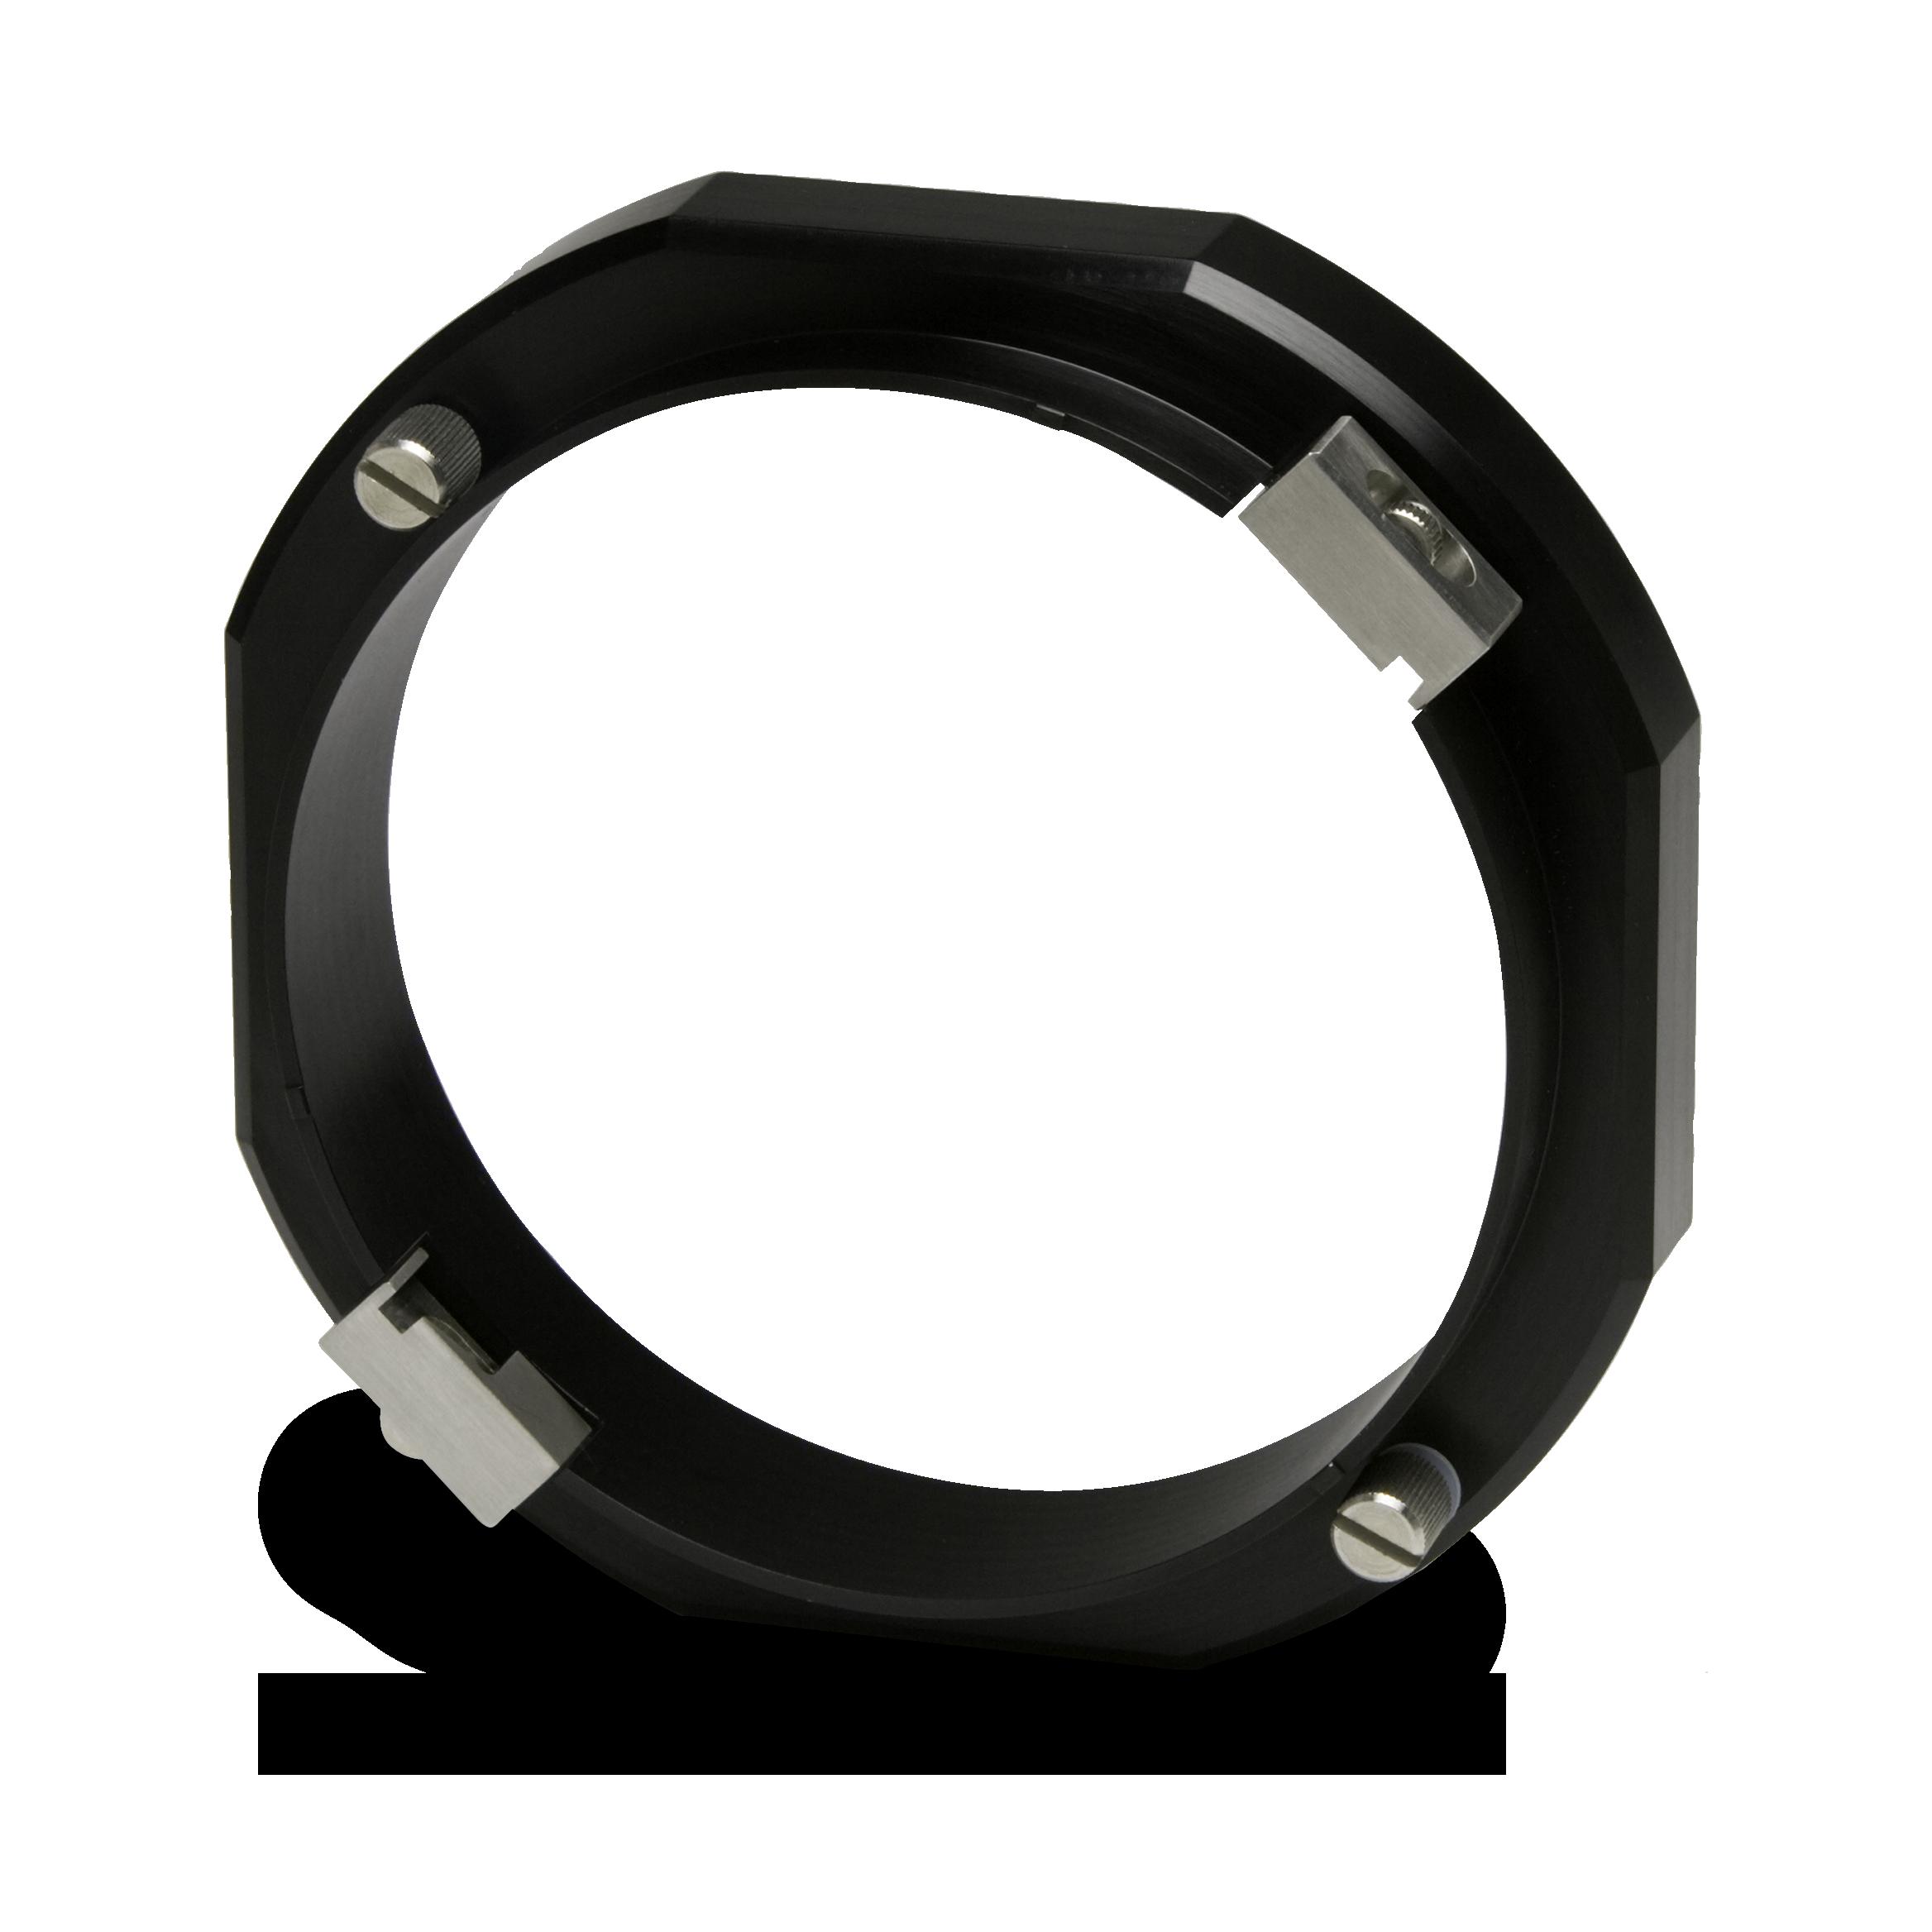 Fizeau accessories, mounts and optics - 4D Technology